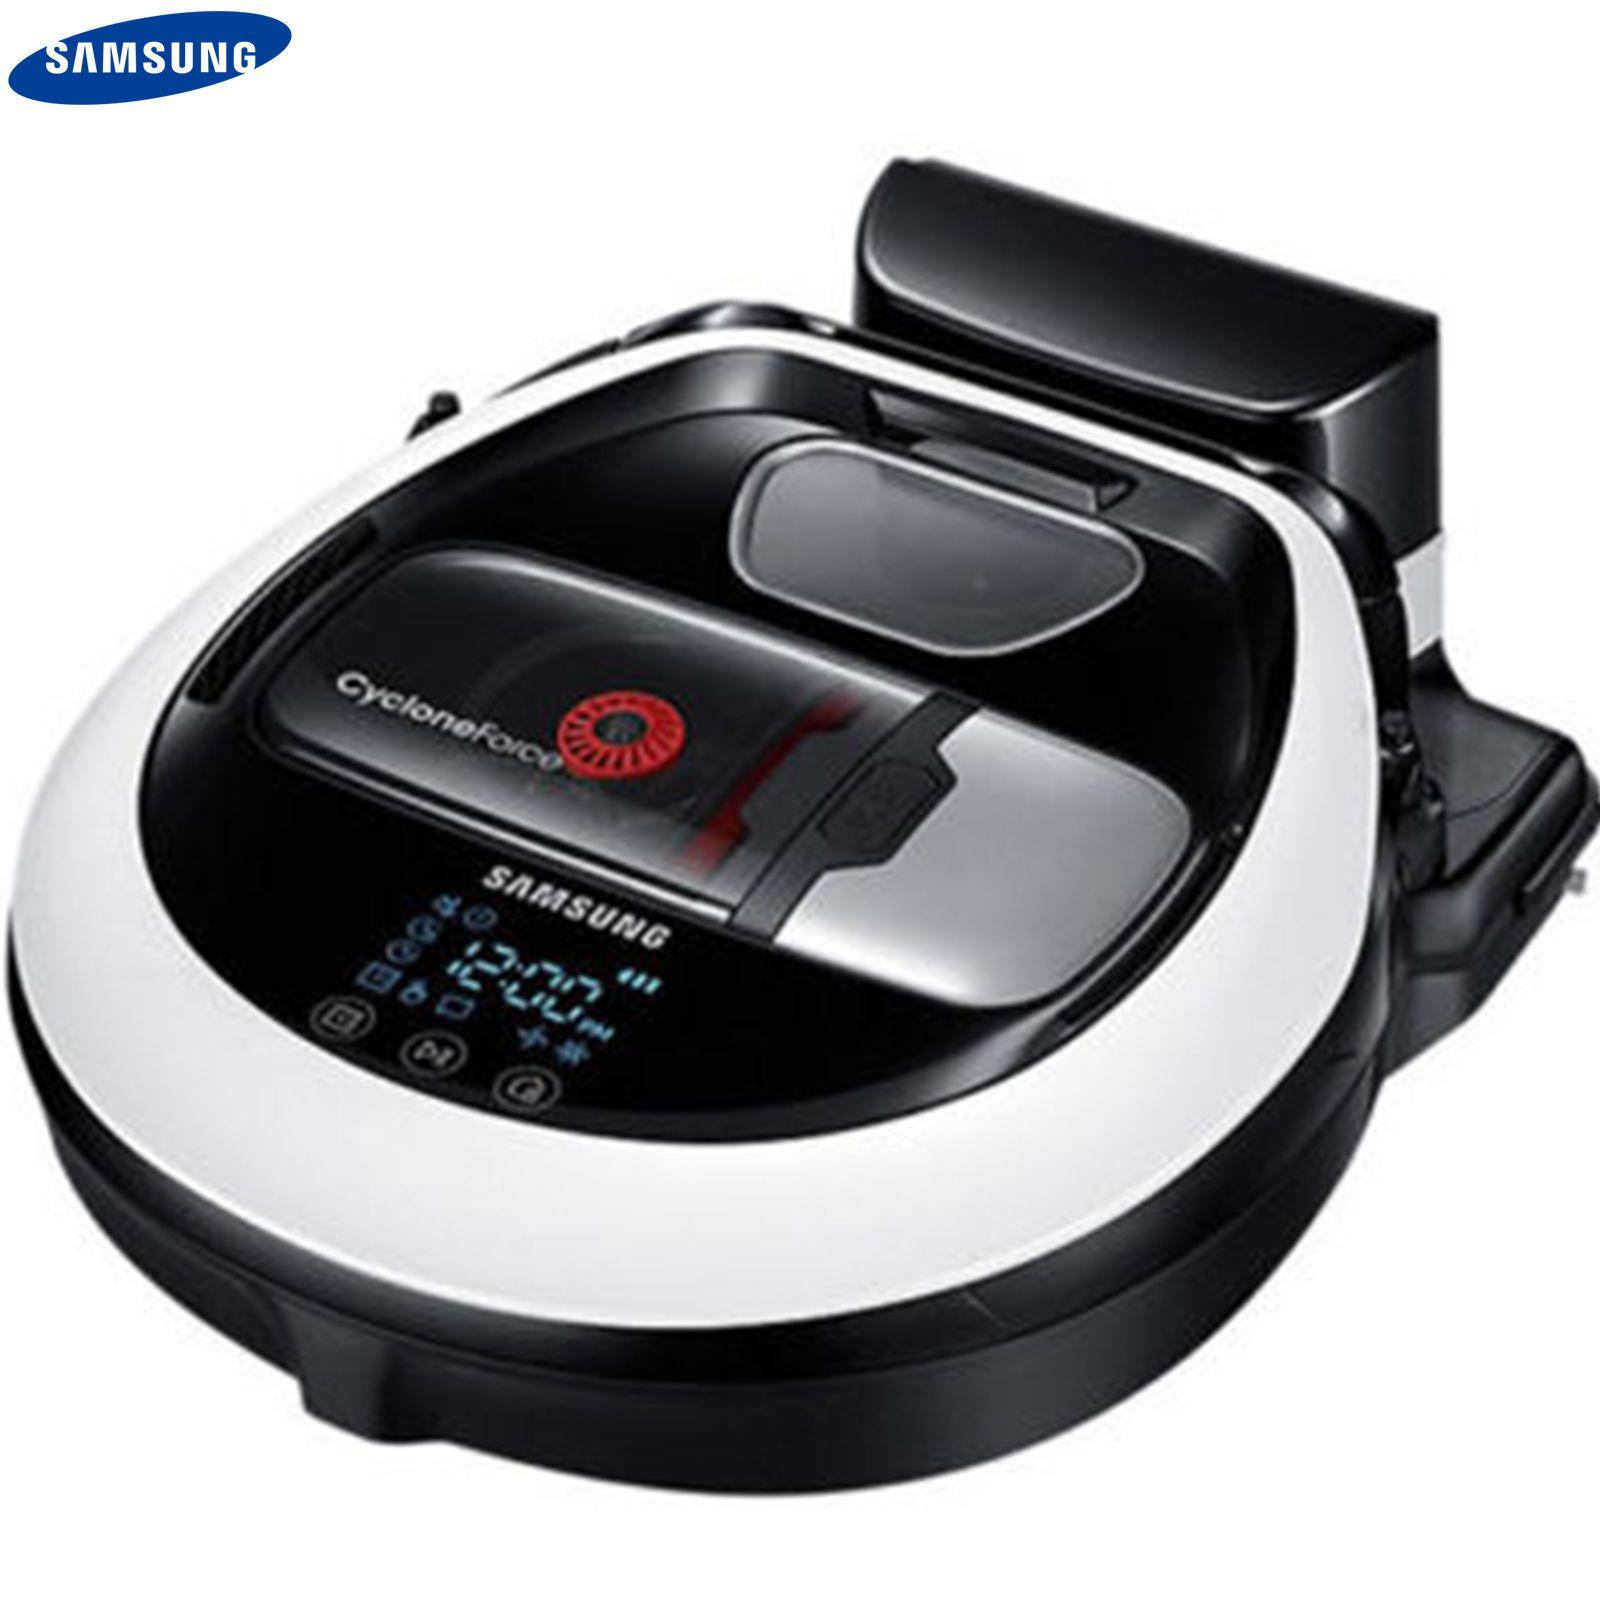 Samsung Powerbot Vr10m7030uw Robot Vacuum Cleaner Robot Vacuum Robot Vacuum Cleaner Cleaning Master